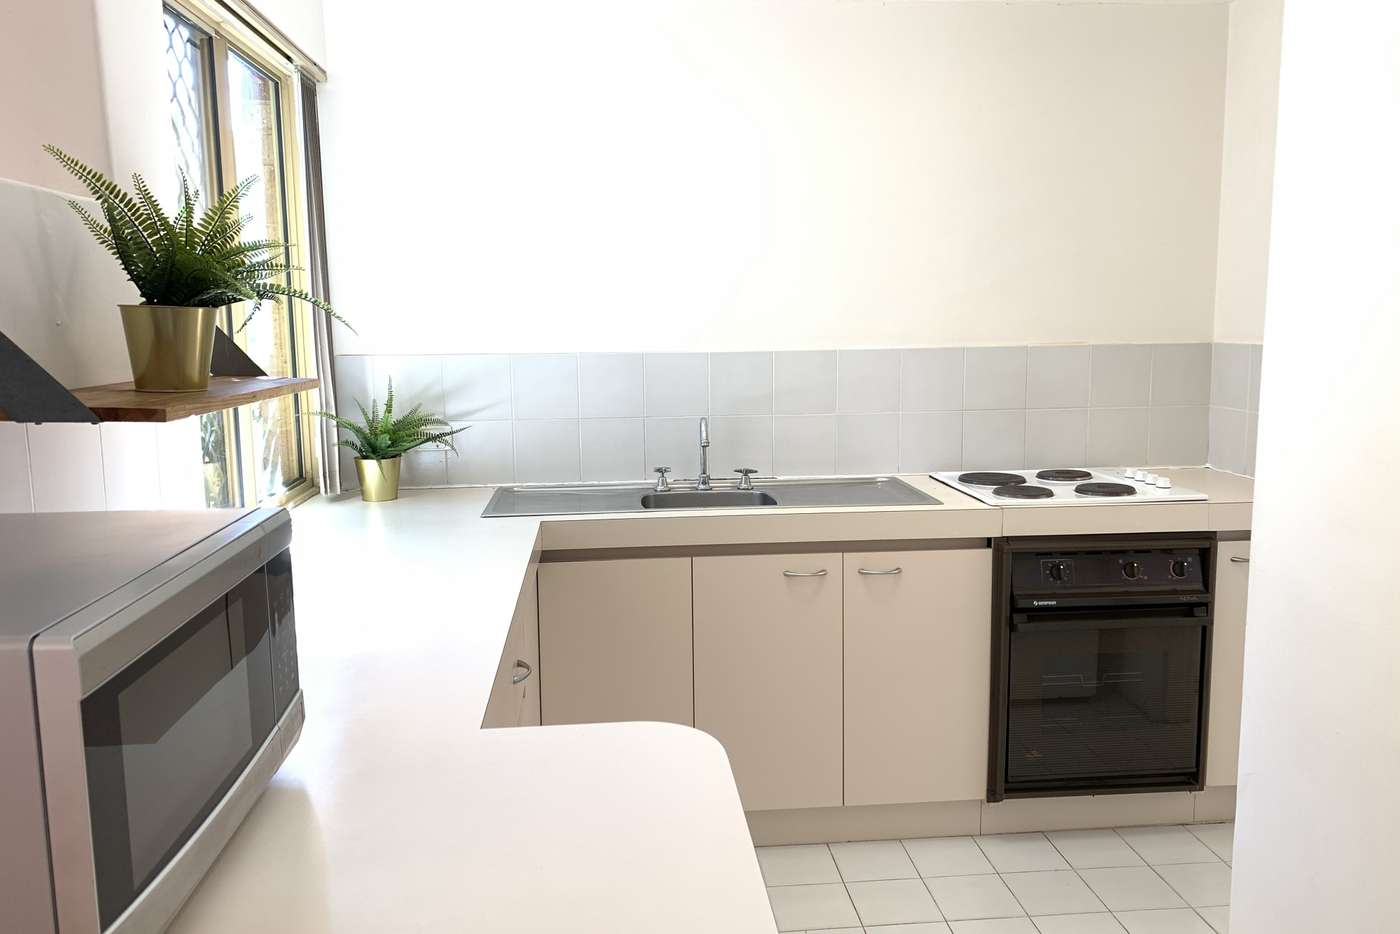 Sixth view of Homely villa listing, 3/72 Leonard Street, Victoria Park WA 6100